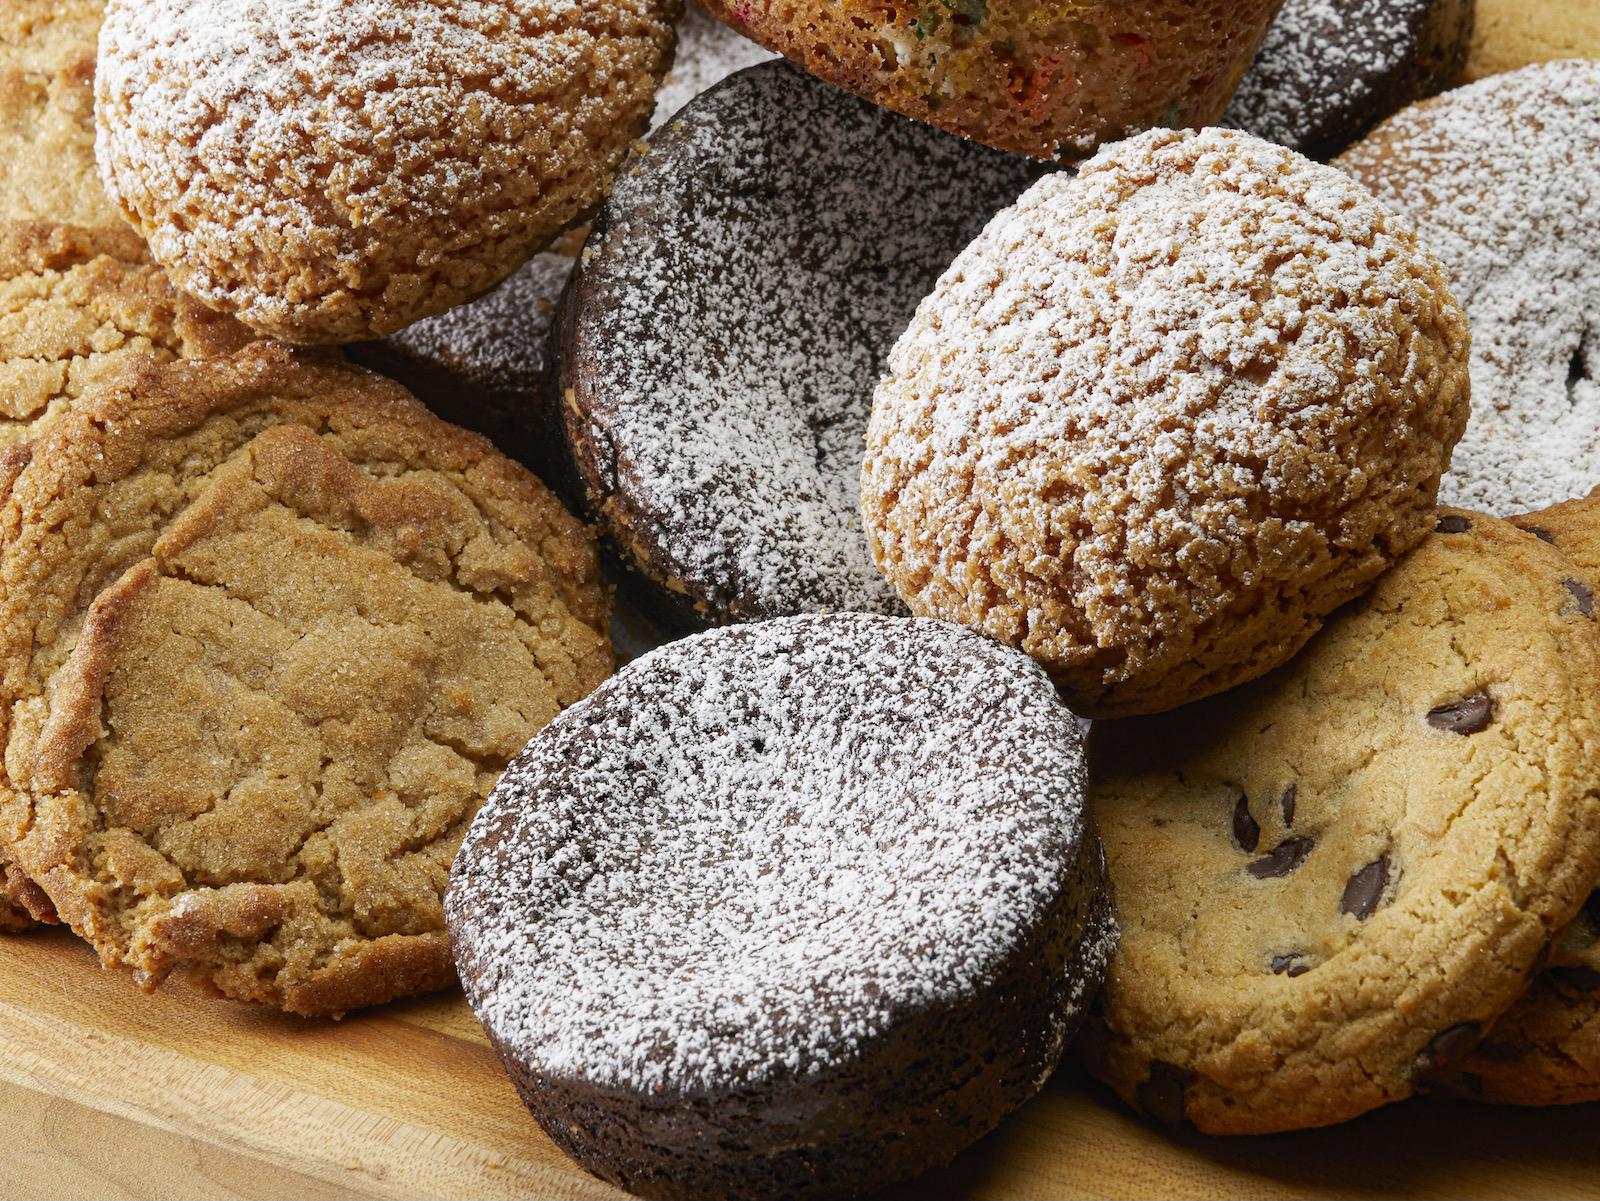 Mid-Way Bakery goods